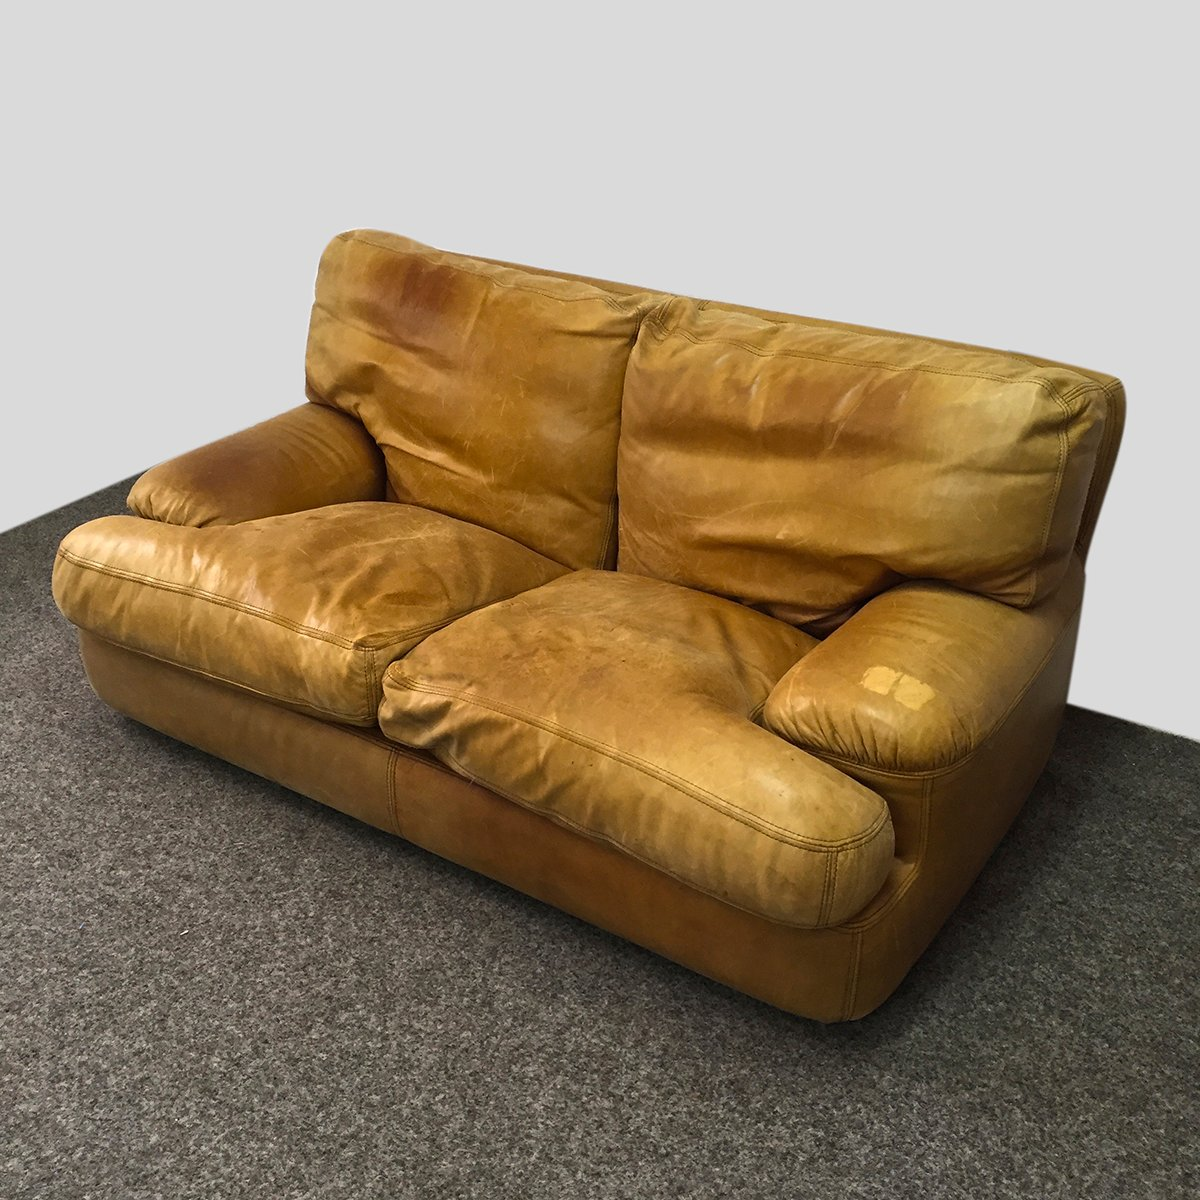 ledersofa mit federn gepolstert 1970er bei pamono kaufen. Black Bedroom Furniture Sets. Home Design Ideas